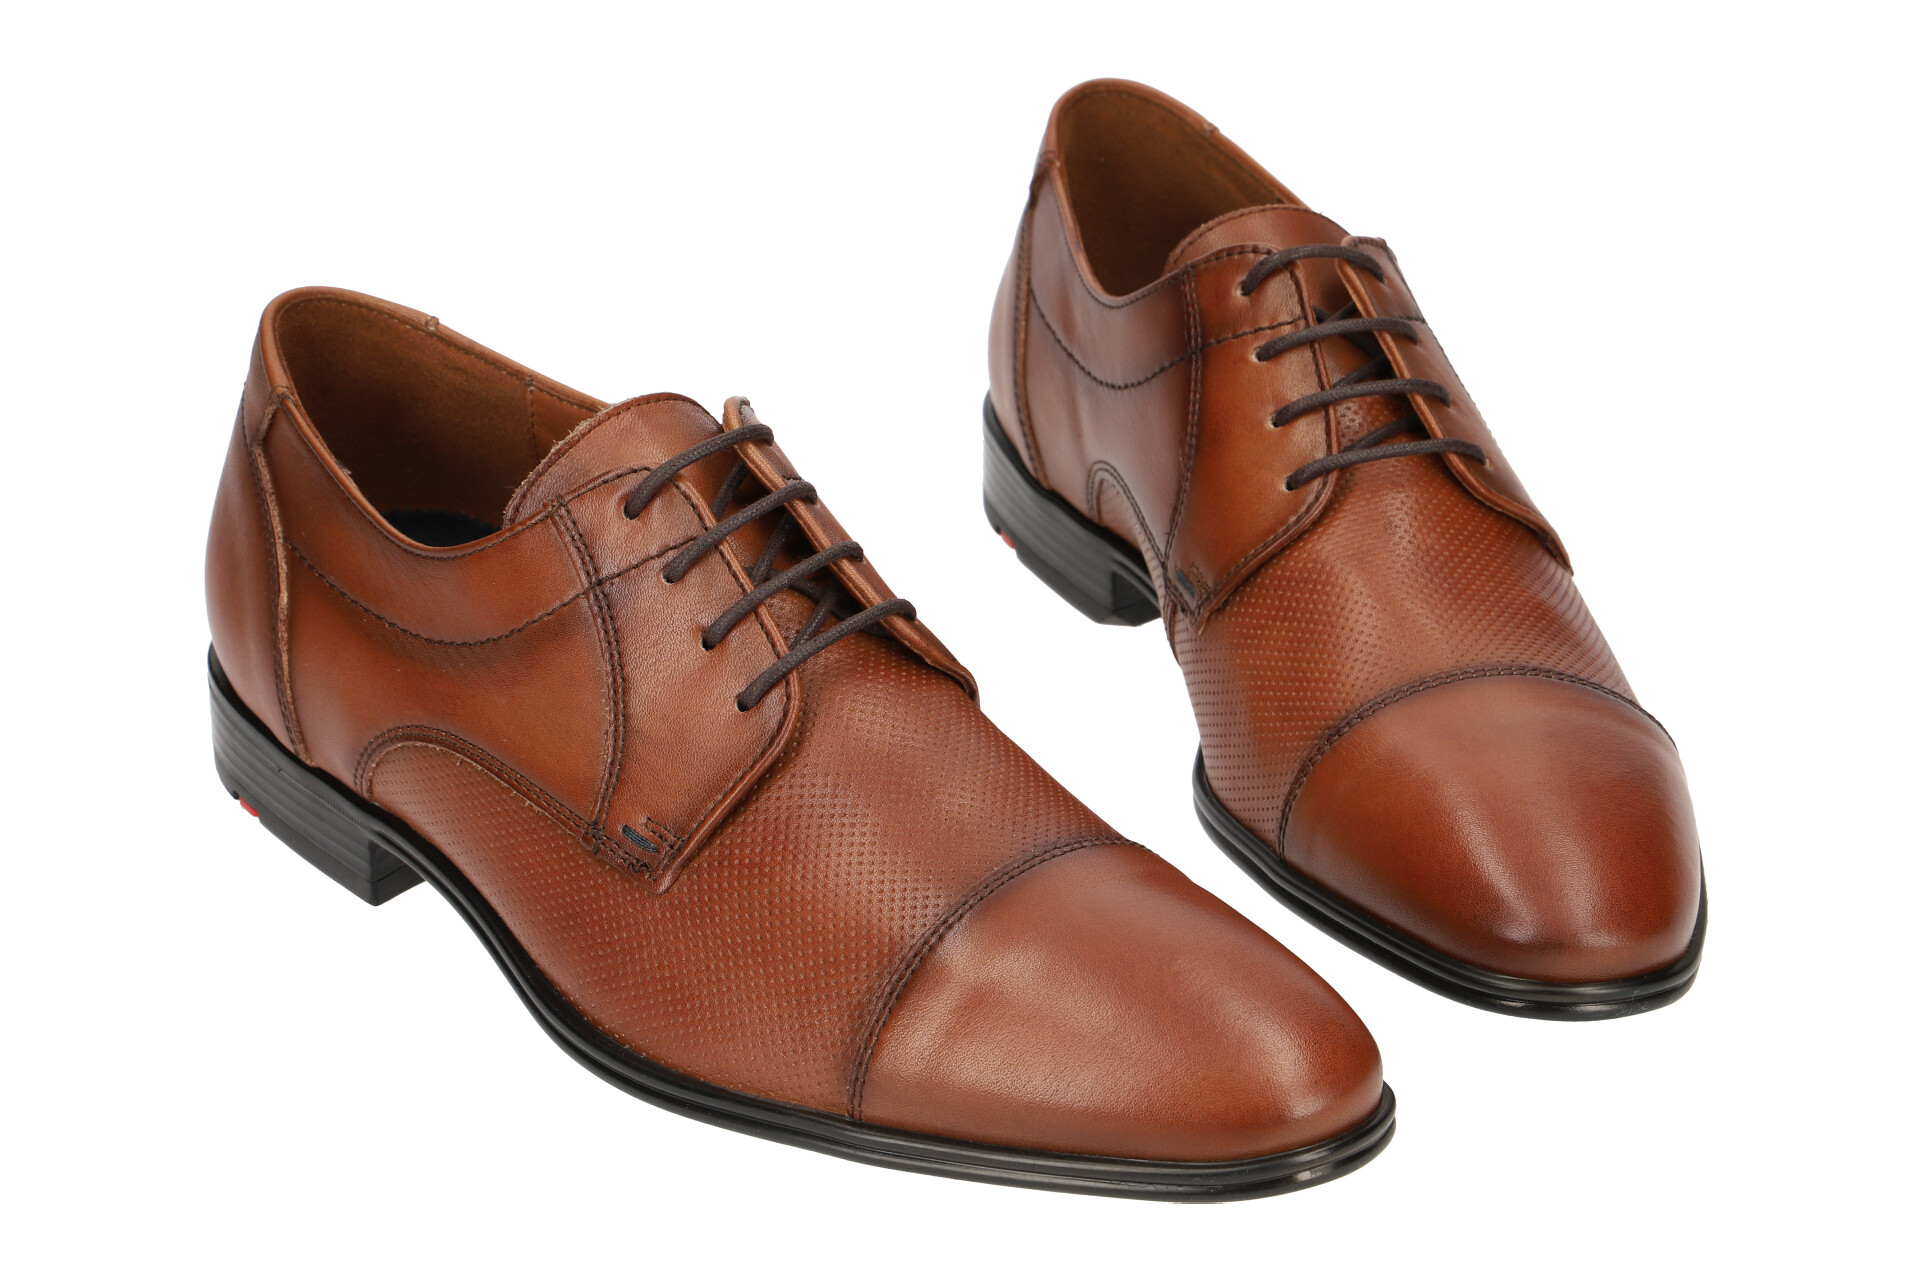 067 Lloyd Elegante Halbschuhe Neu 13 Braun Schuhe 19 Details Zu Oskar Herrenschuhe ZOTPkXiu